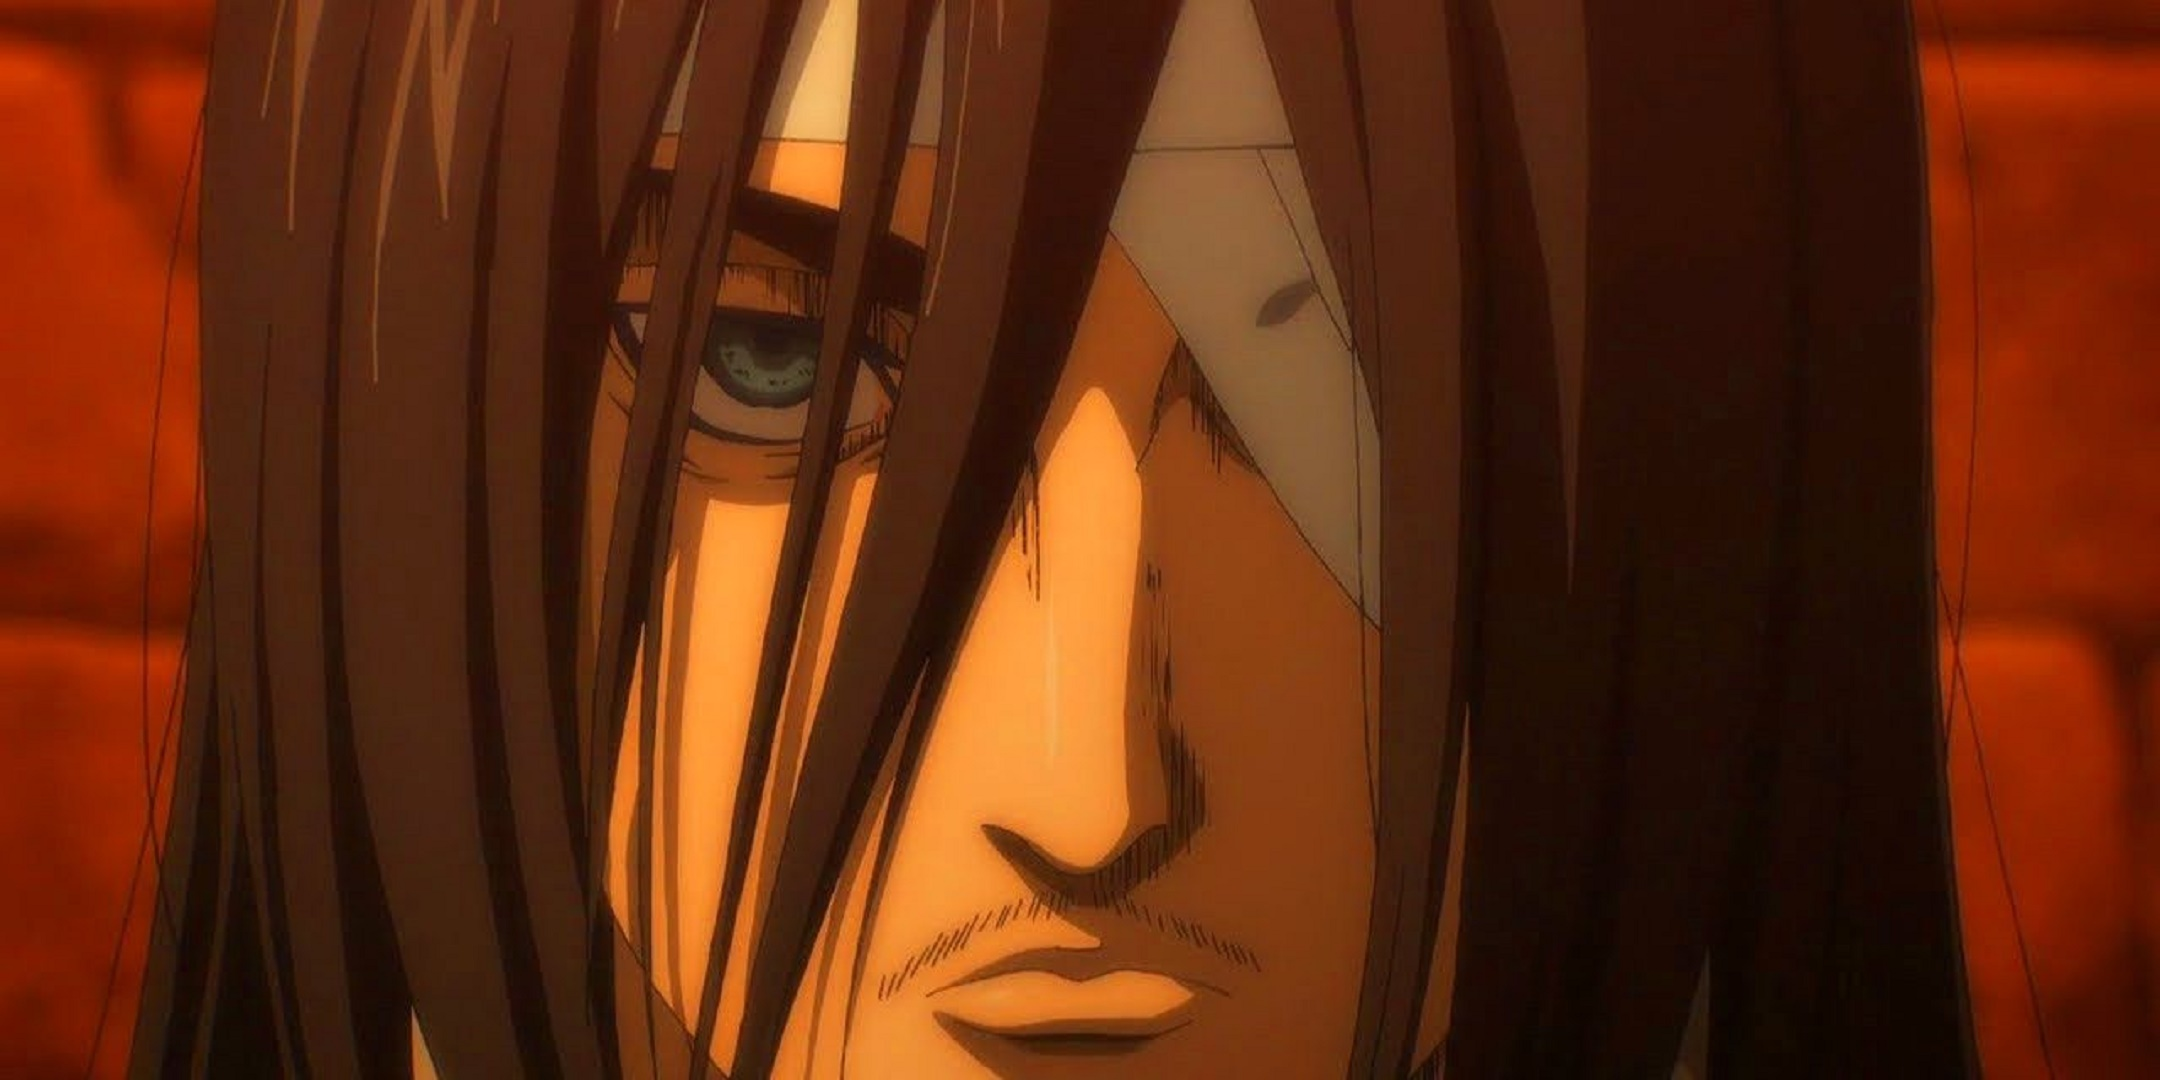 Attack on Titan Final Season 4 Episode 4 Eren header 1